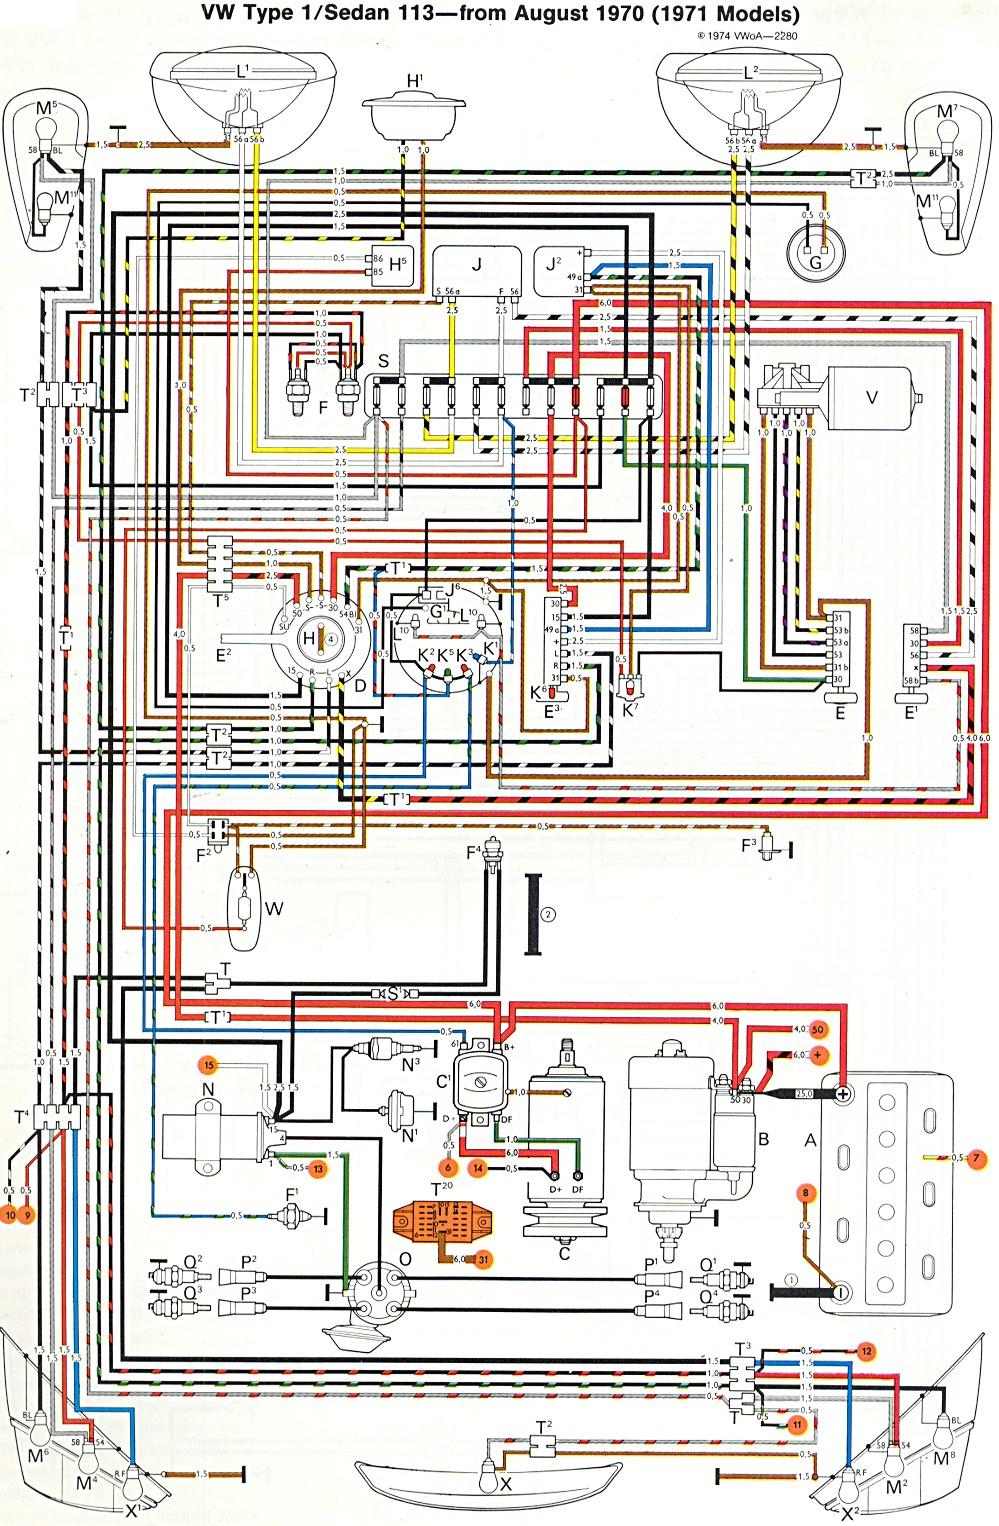 vw t4 wiring diagram 9n ford tractor 1965 bug 99 volkswagen cabrio fuse box library1965 block detailed schematics rh